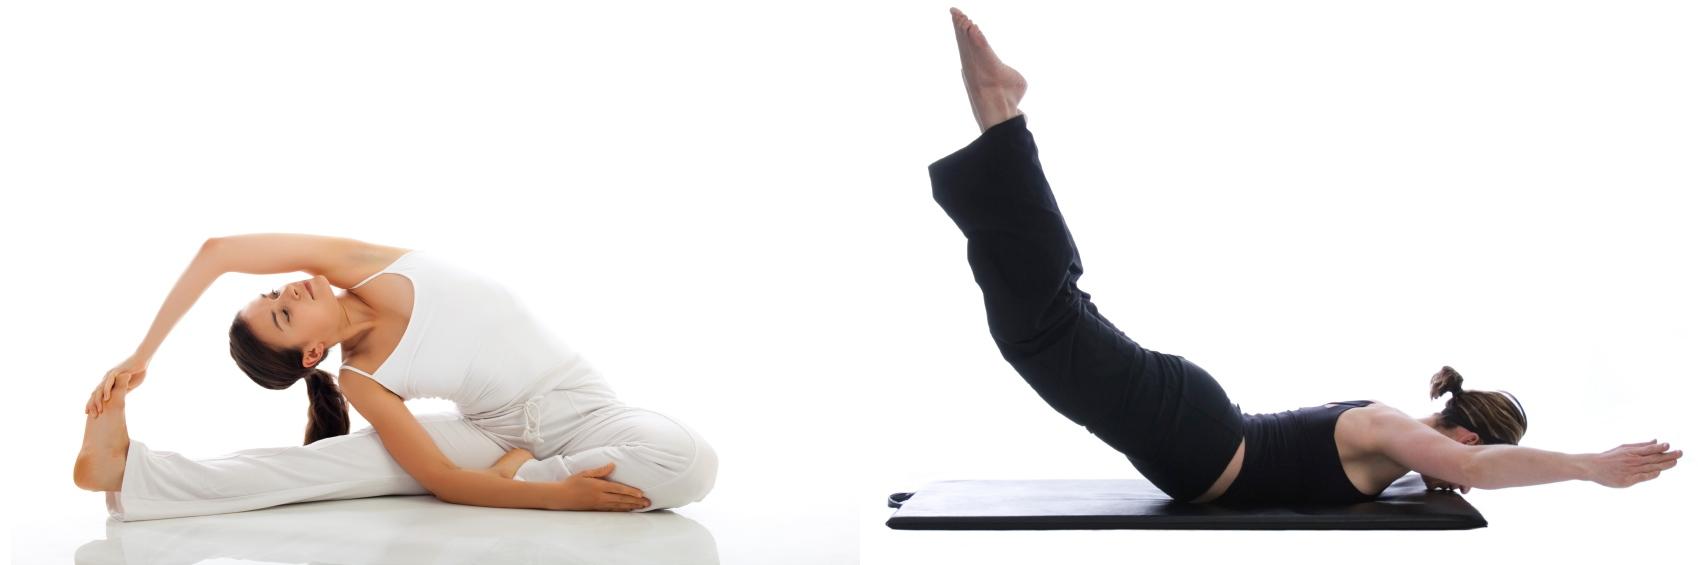 yoga o pilates